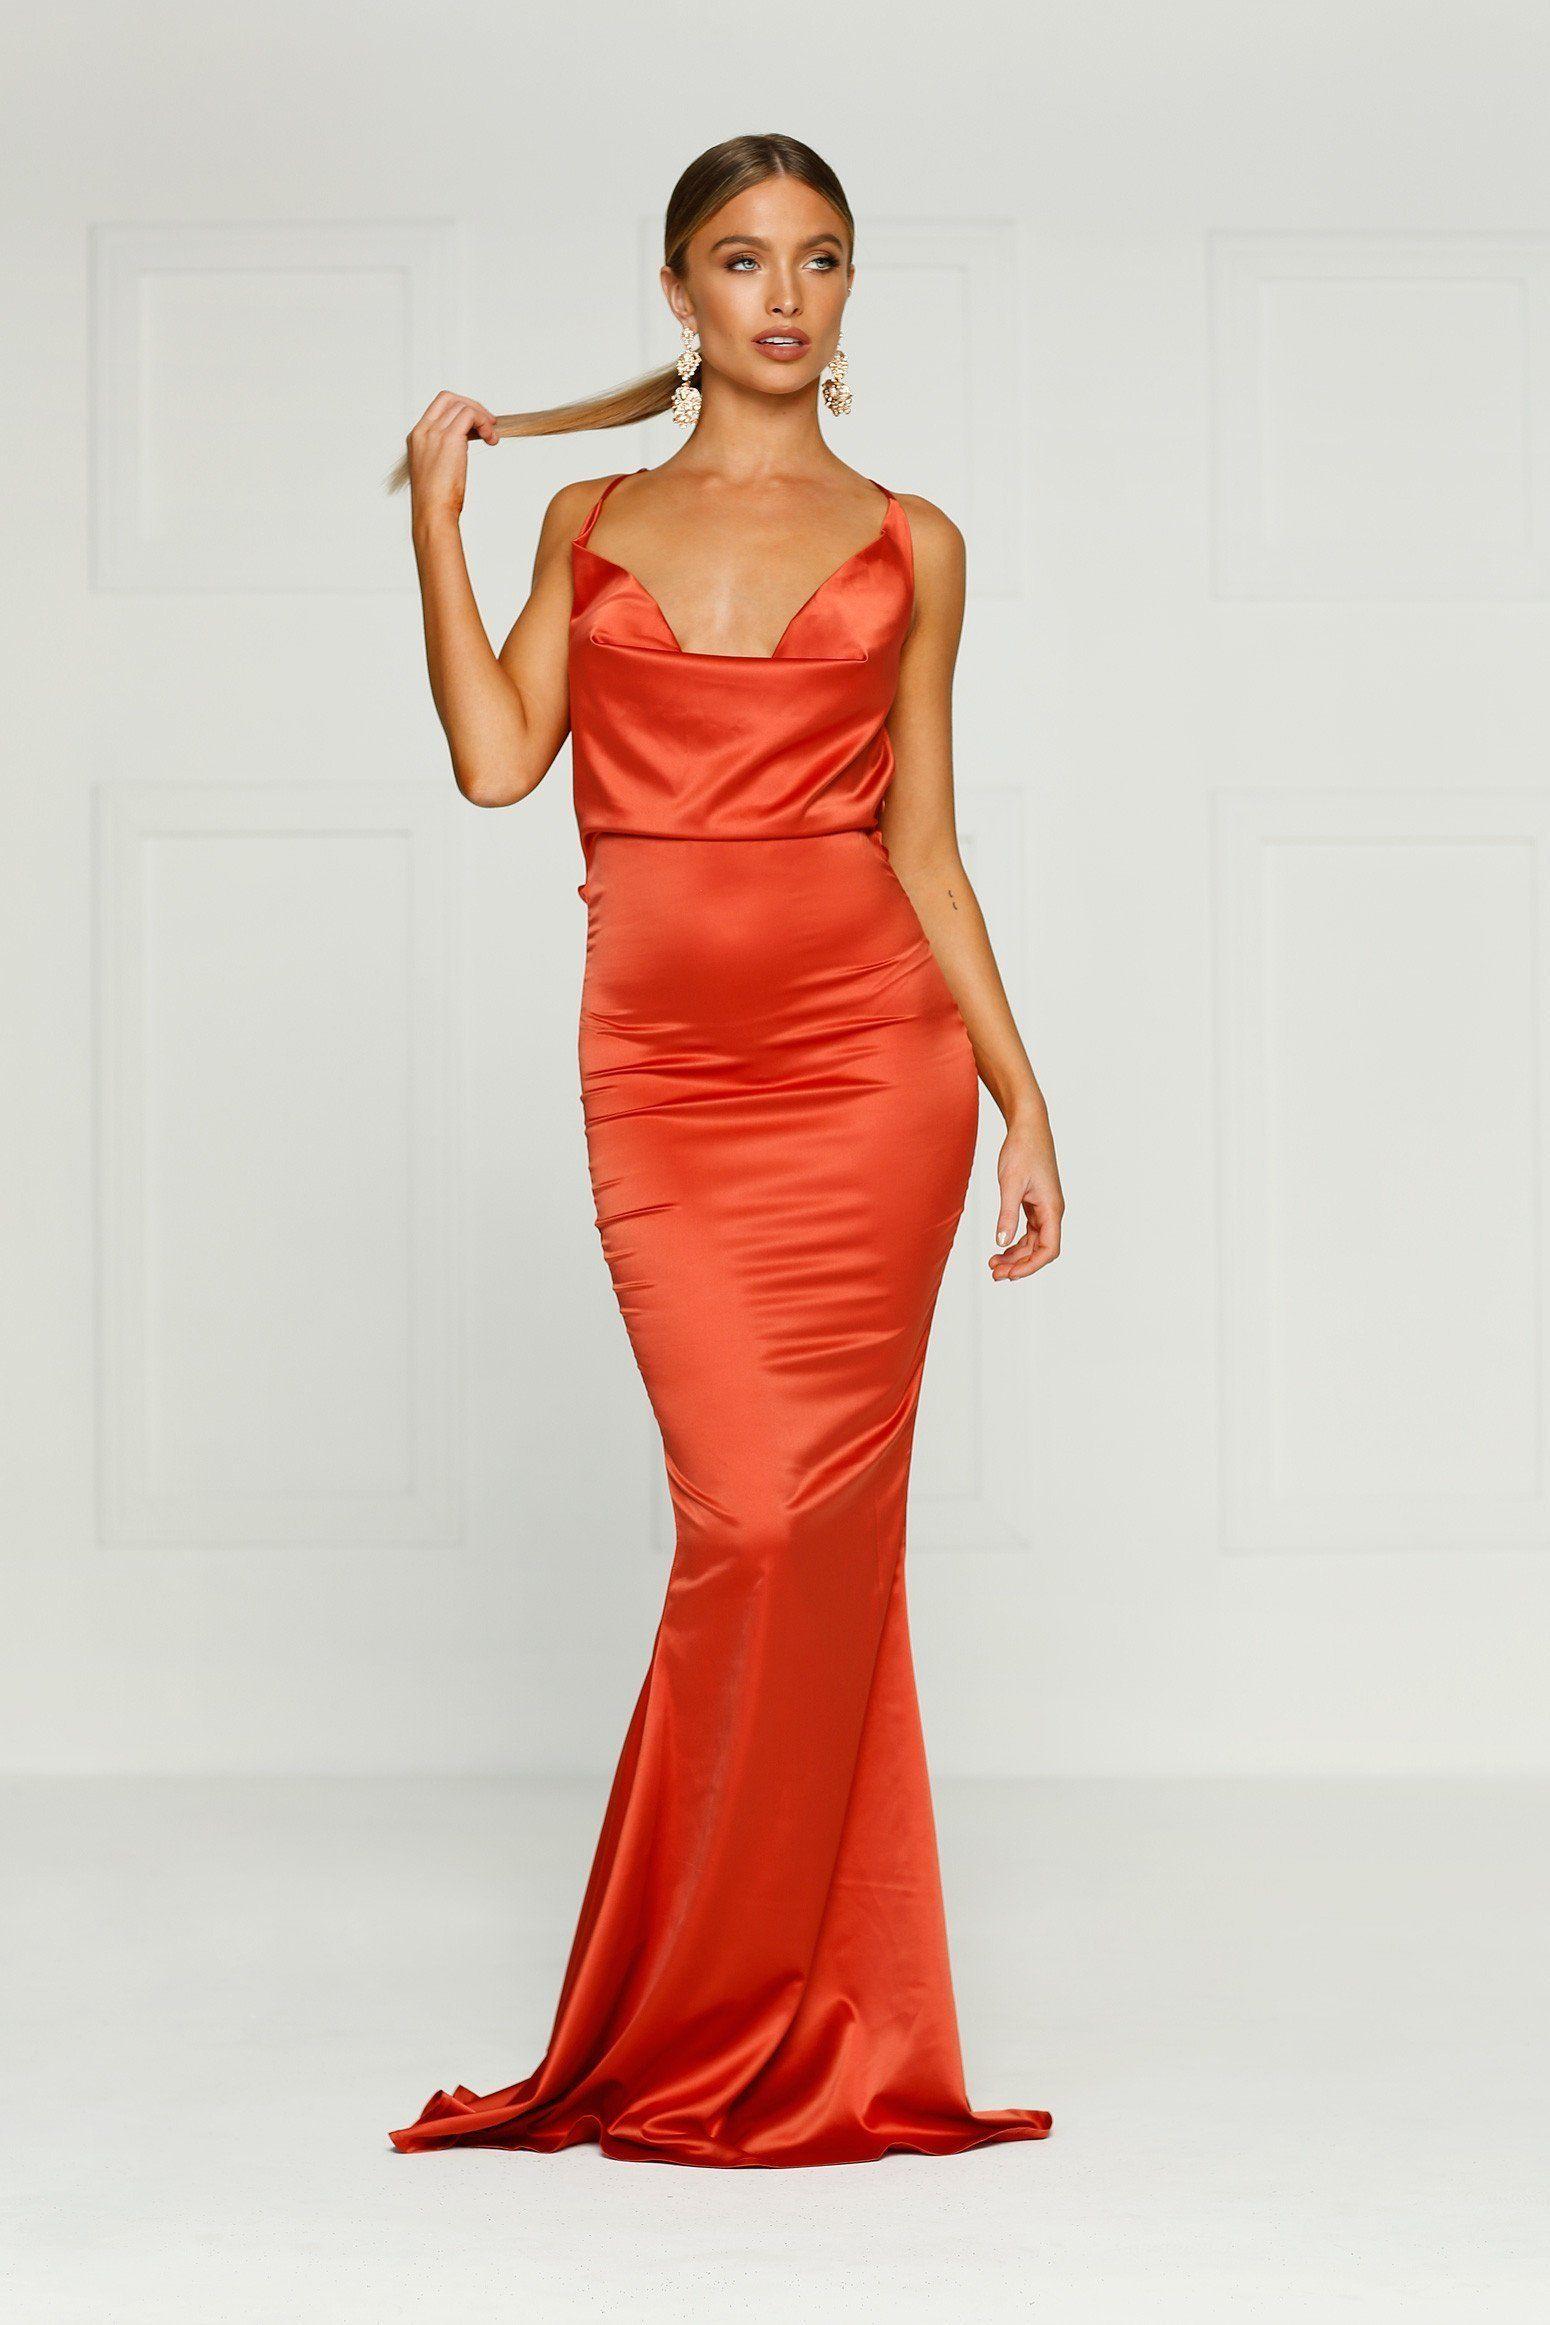 Crisantemi Rust Satin Dress With Cowl Neckline And Low Back Rust Dress Dresses Dazzling Dress